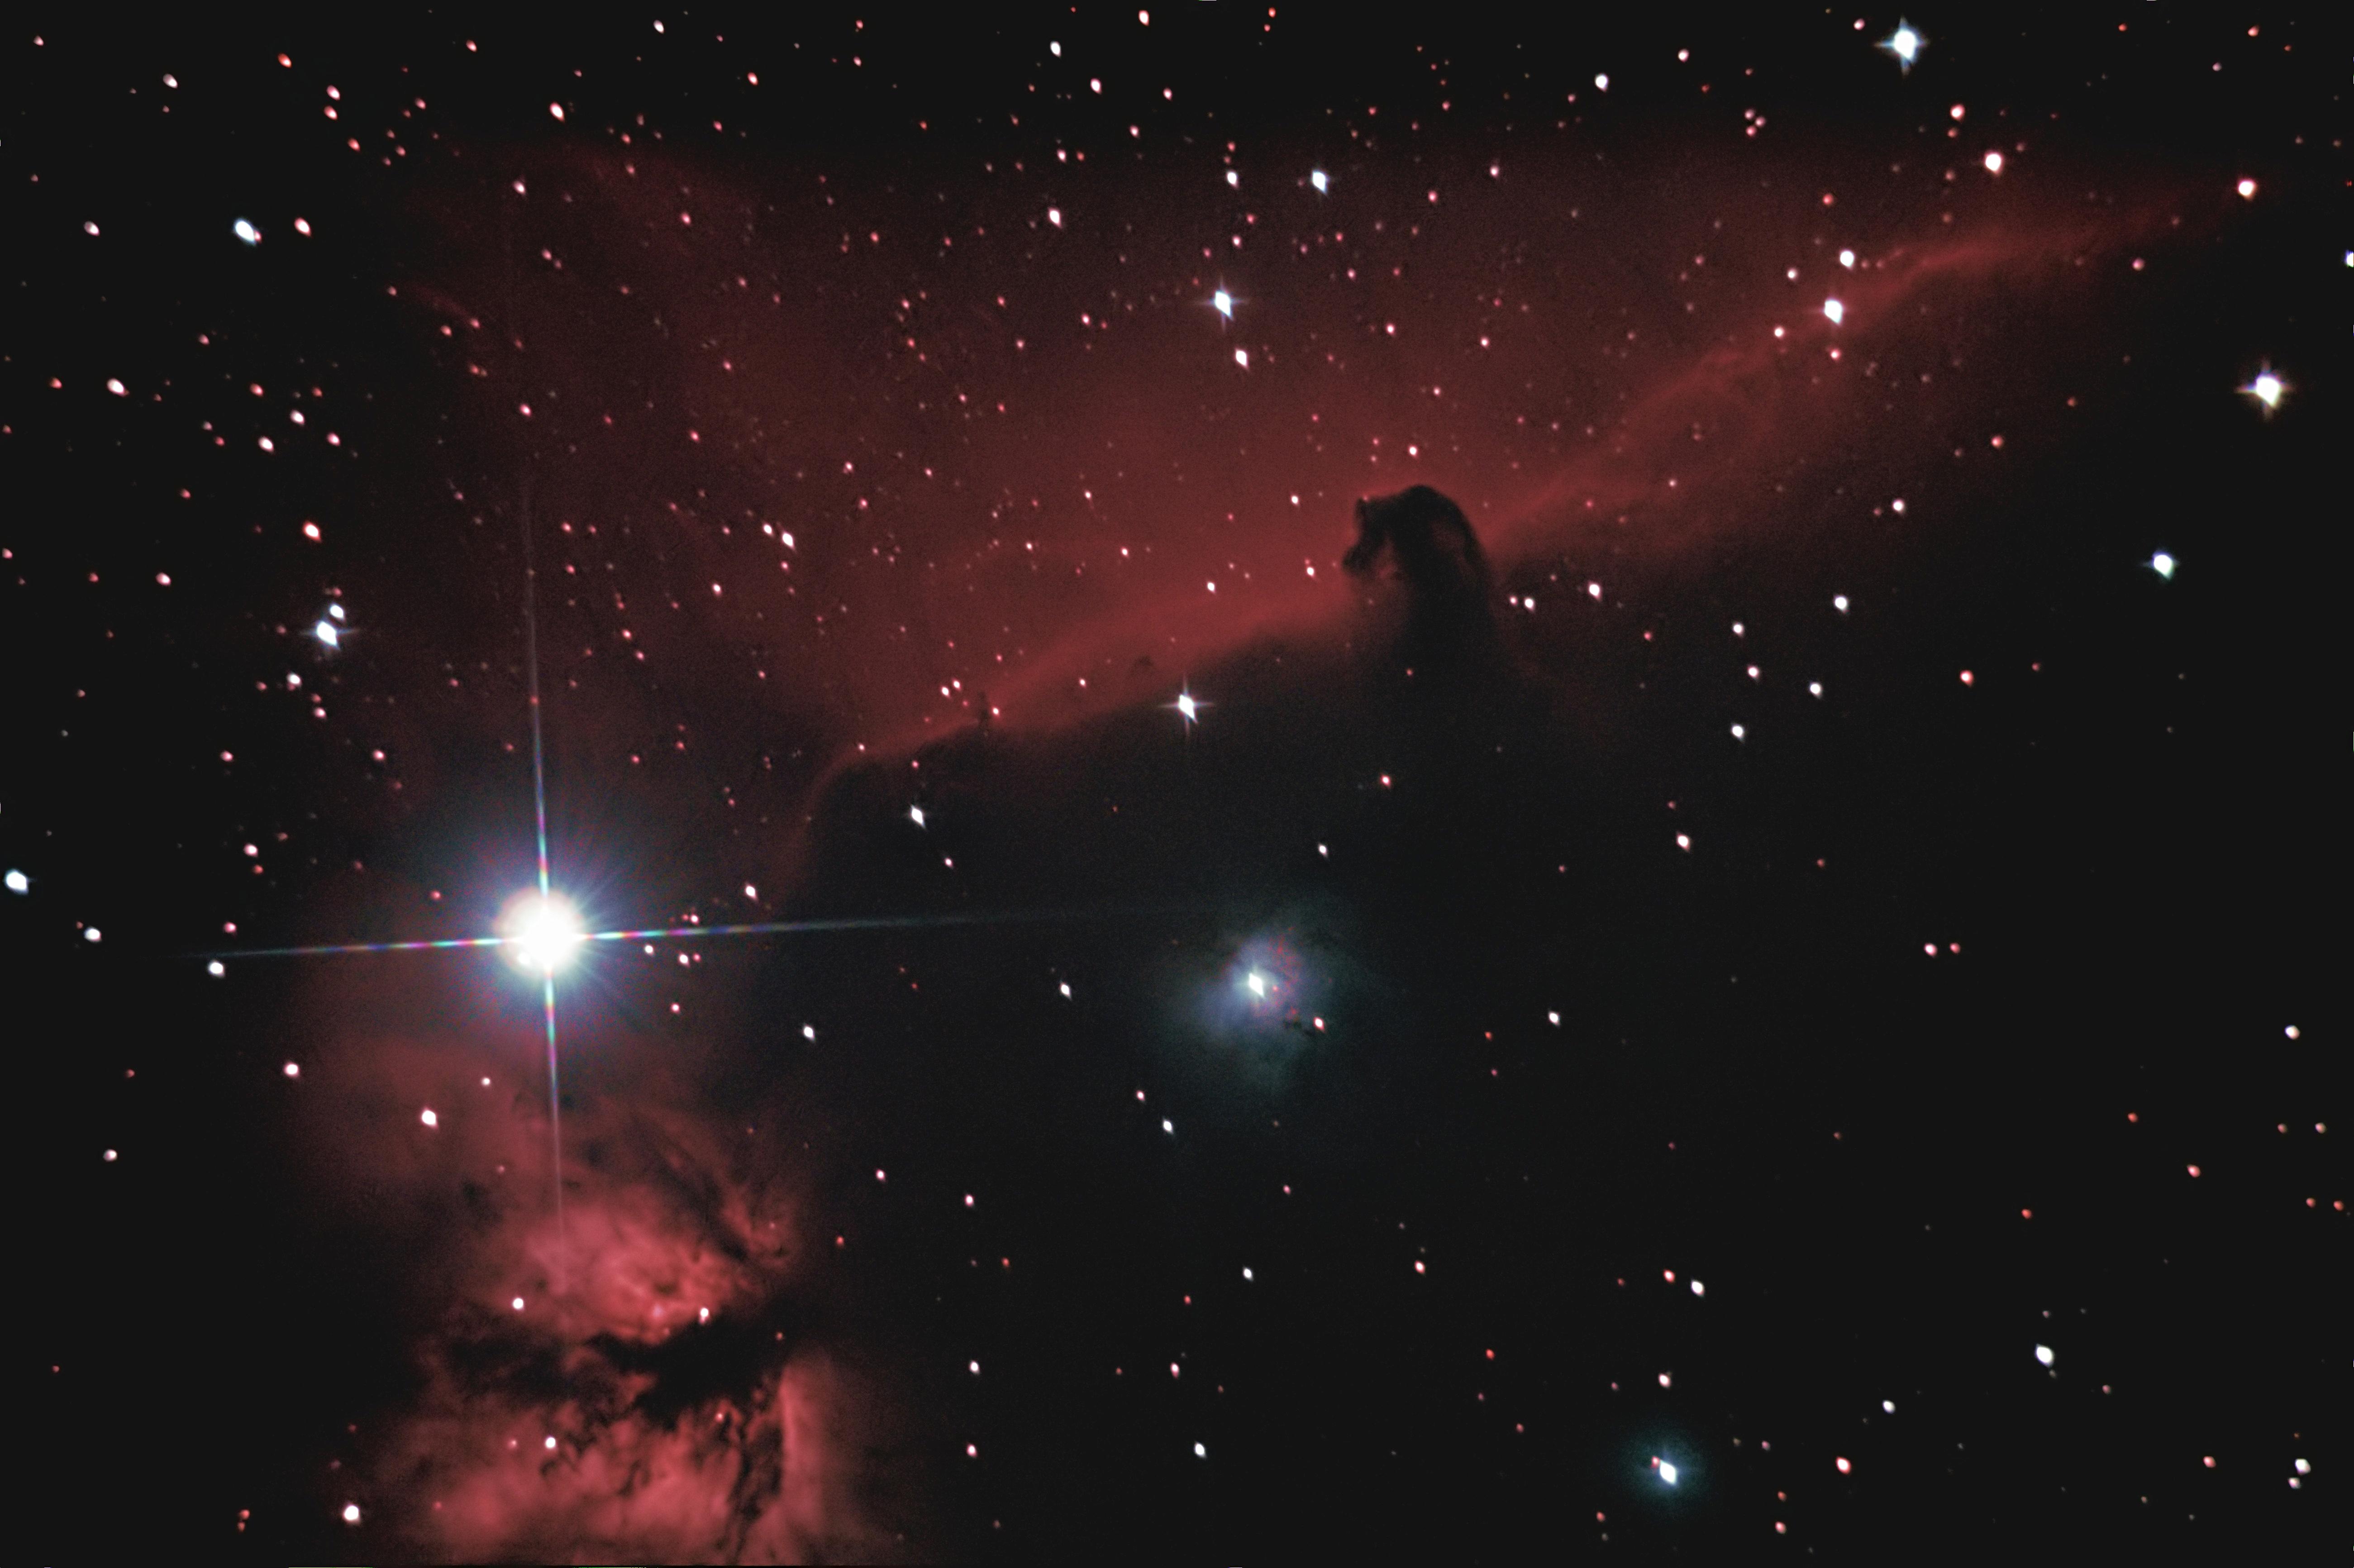 IC 434 fokal 20190215.jpg